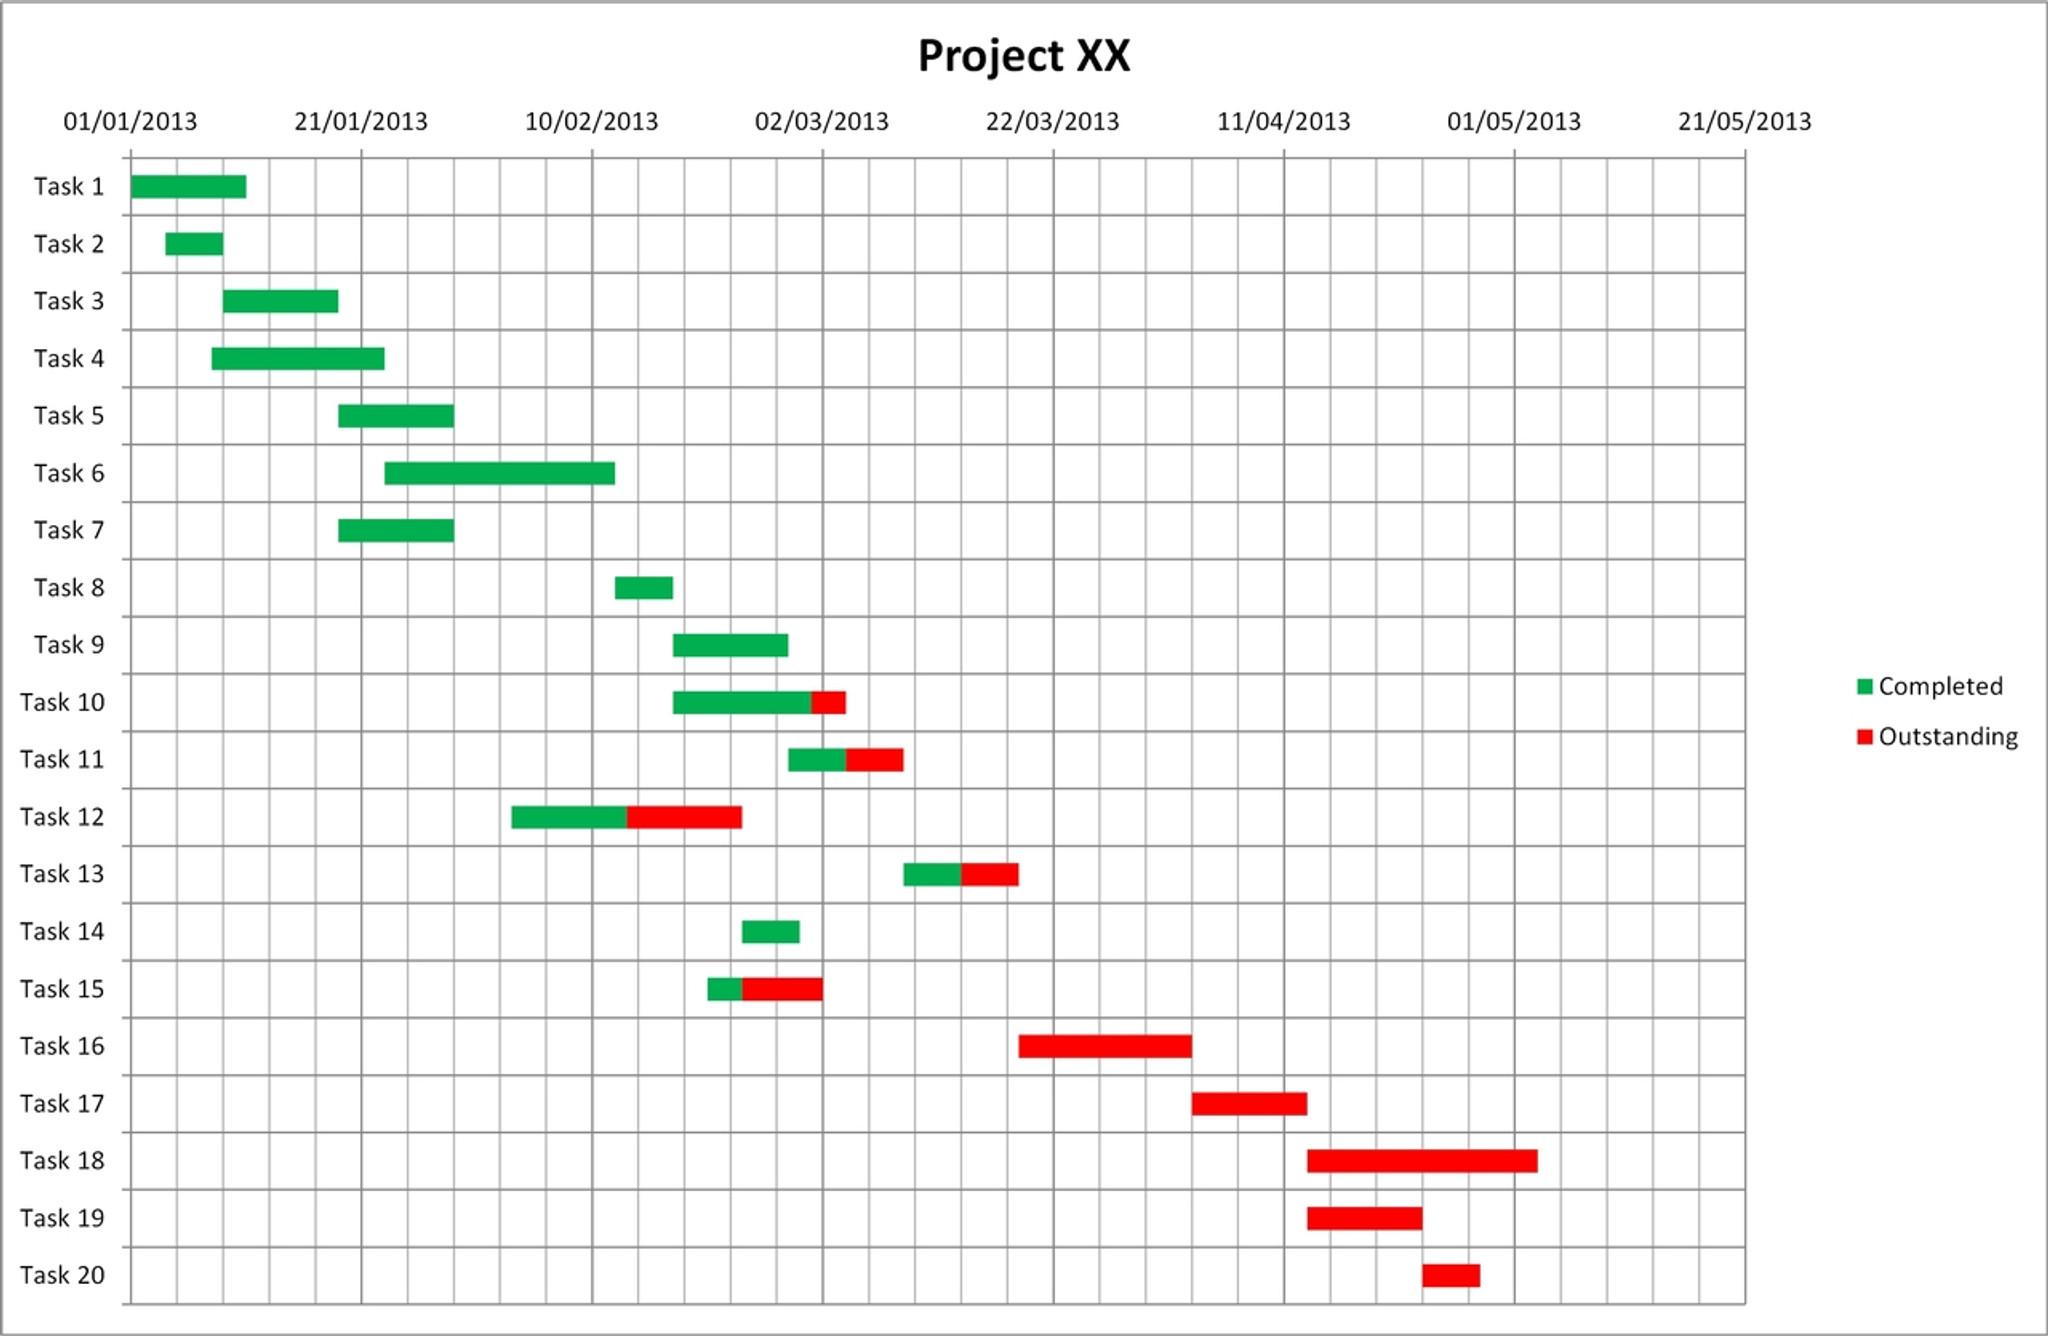 gantt chart template excel creates great gantt charts using excel